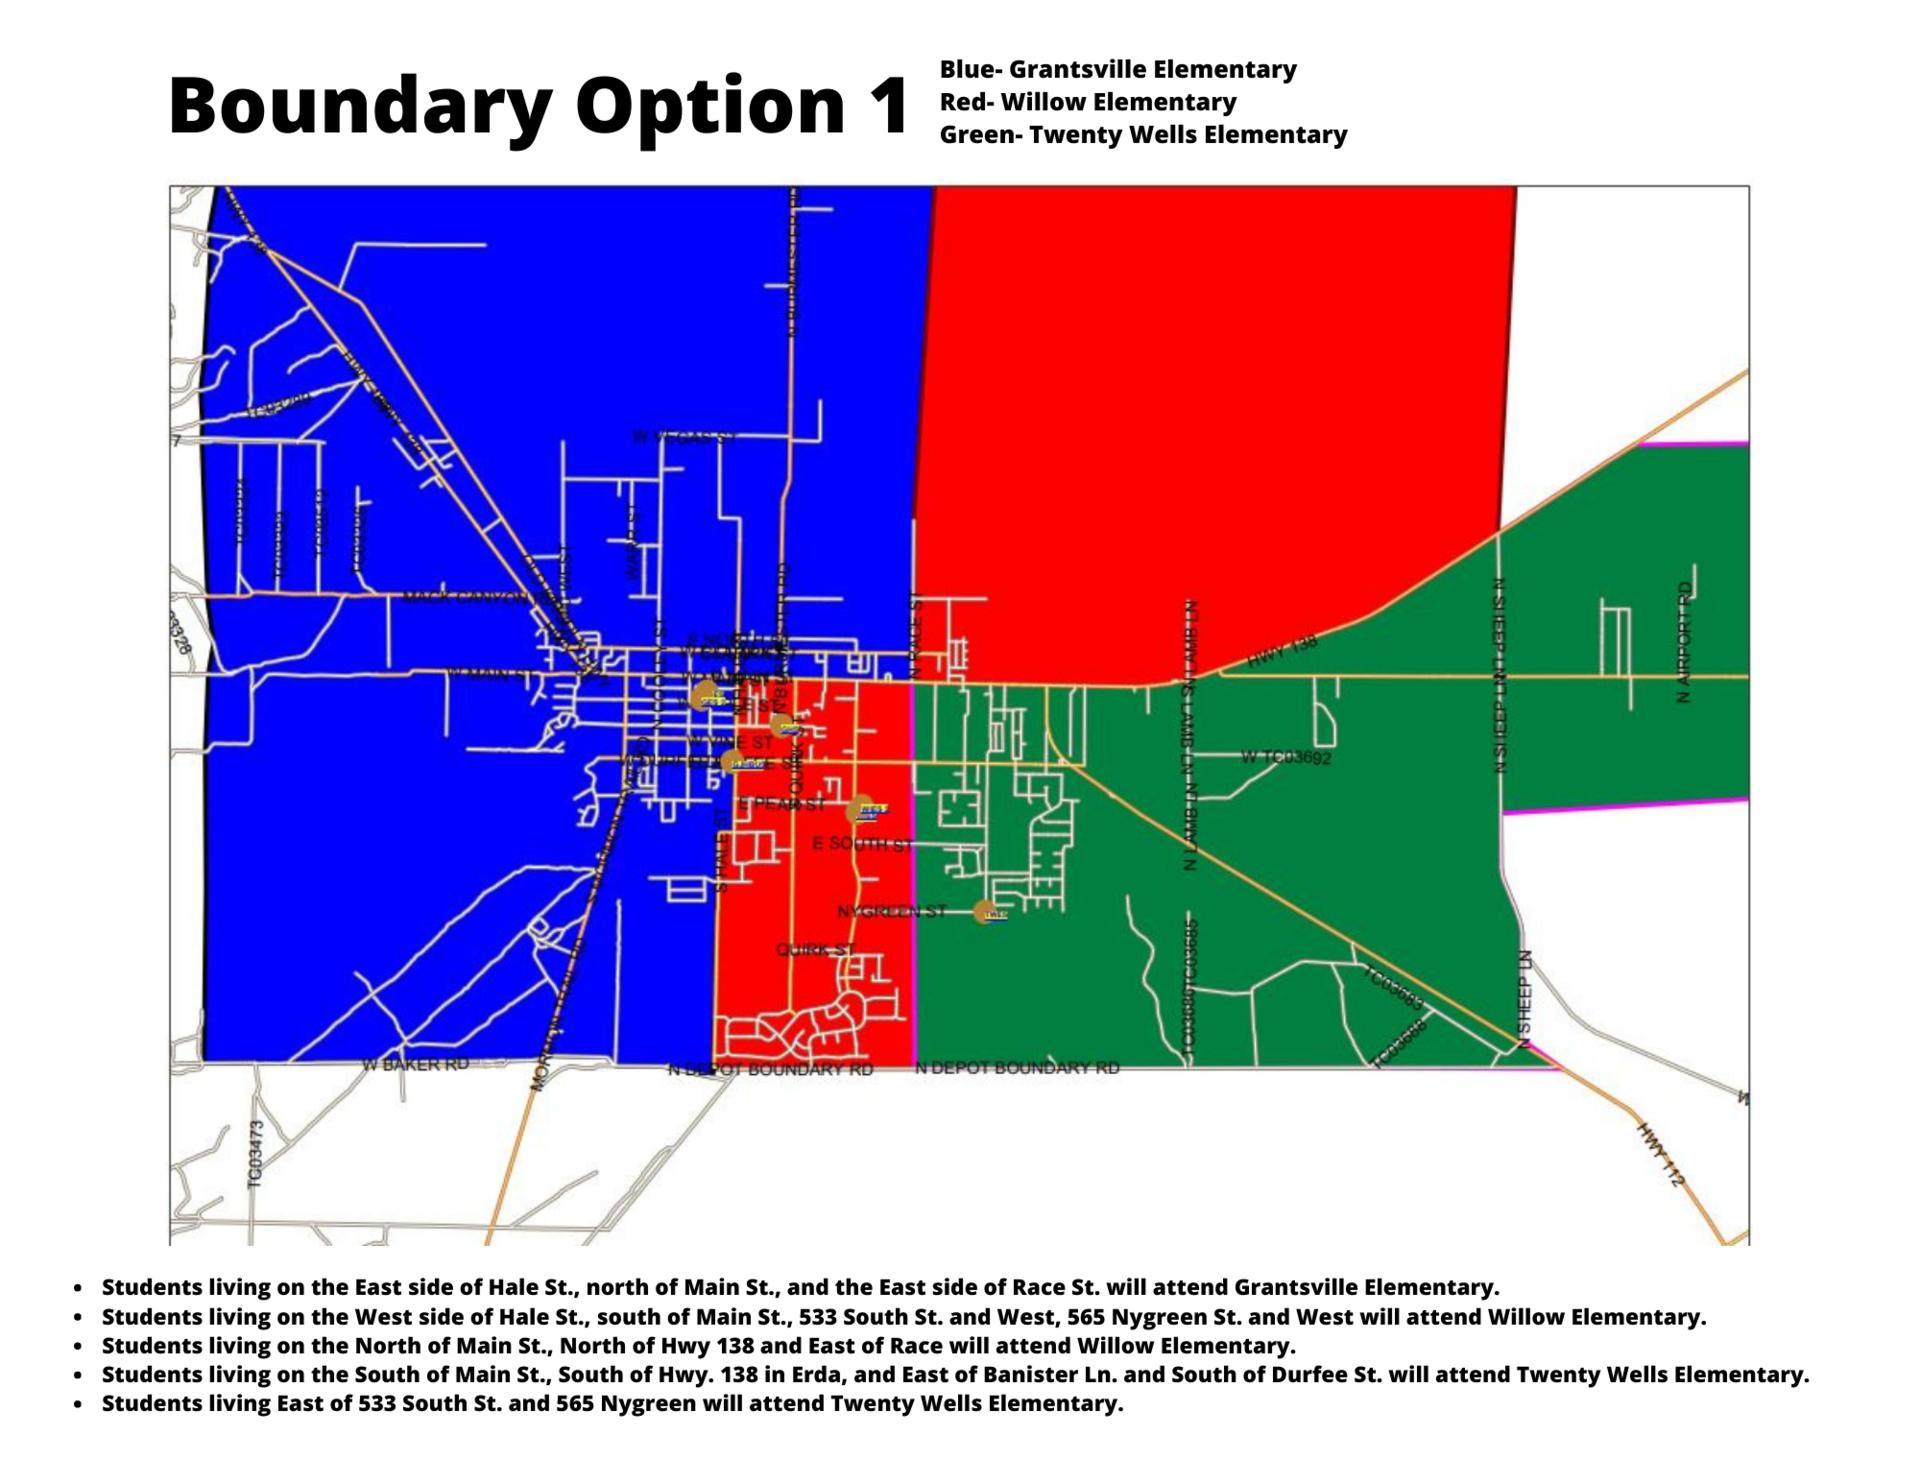 Map of boundary option 1